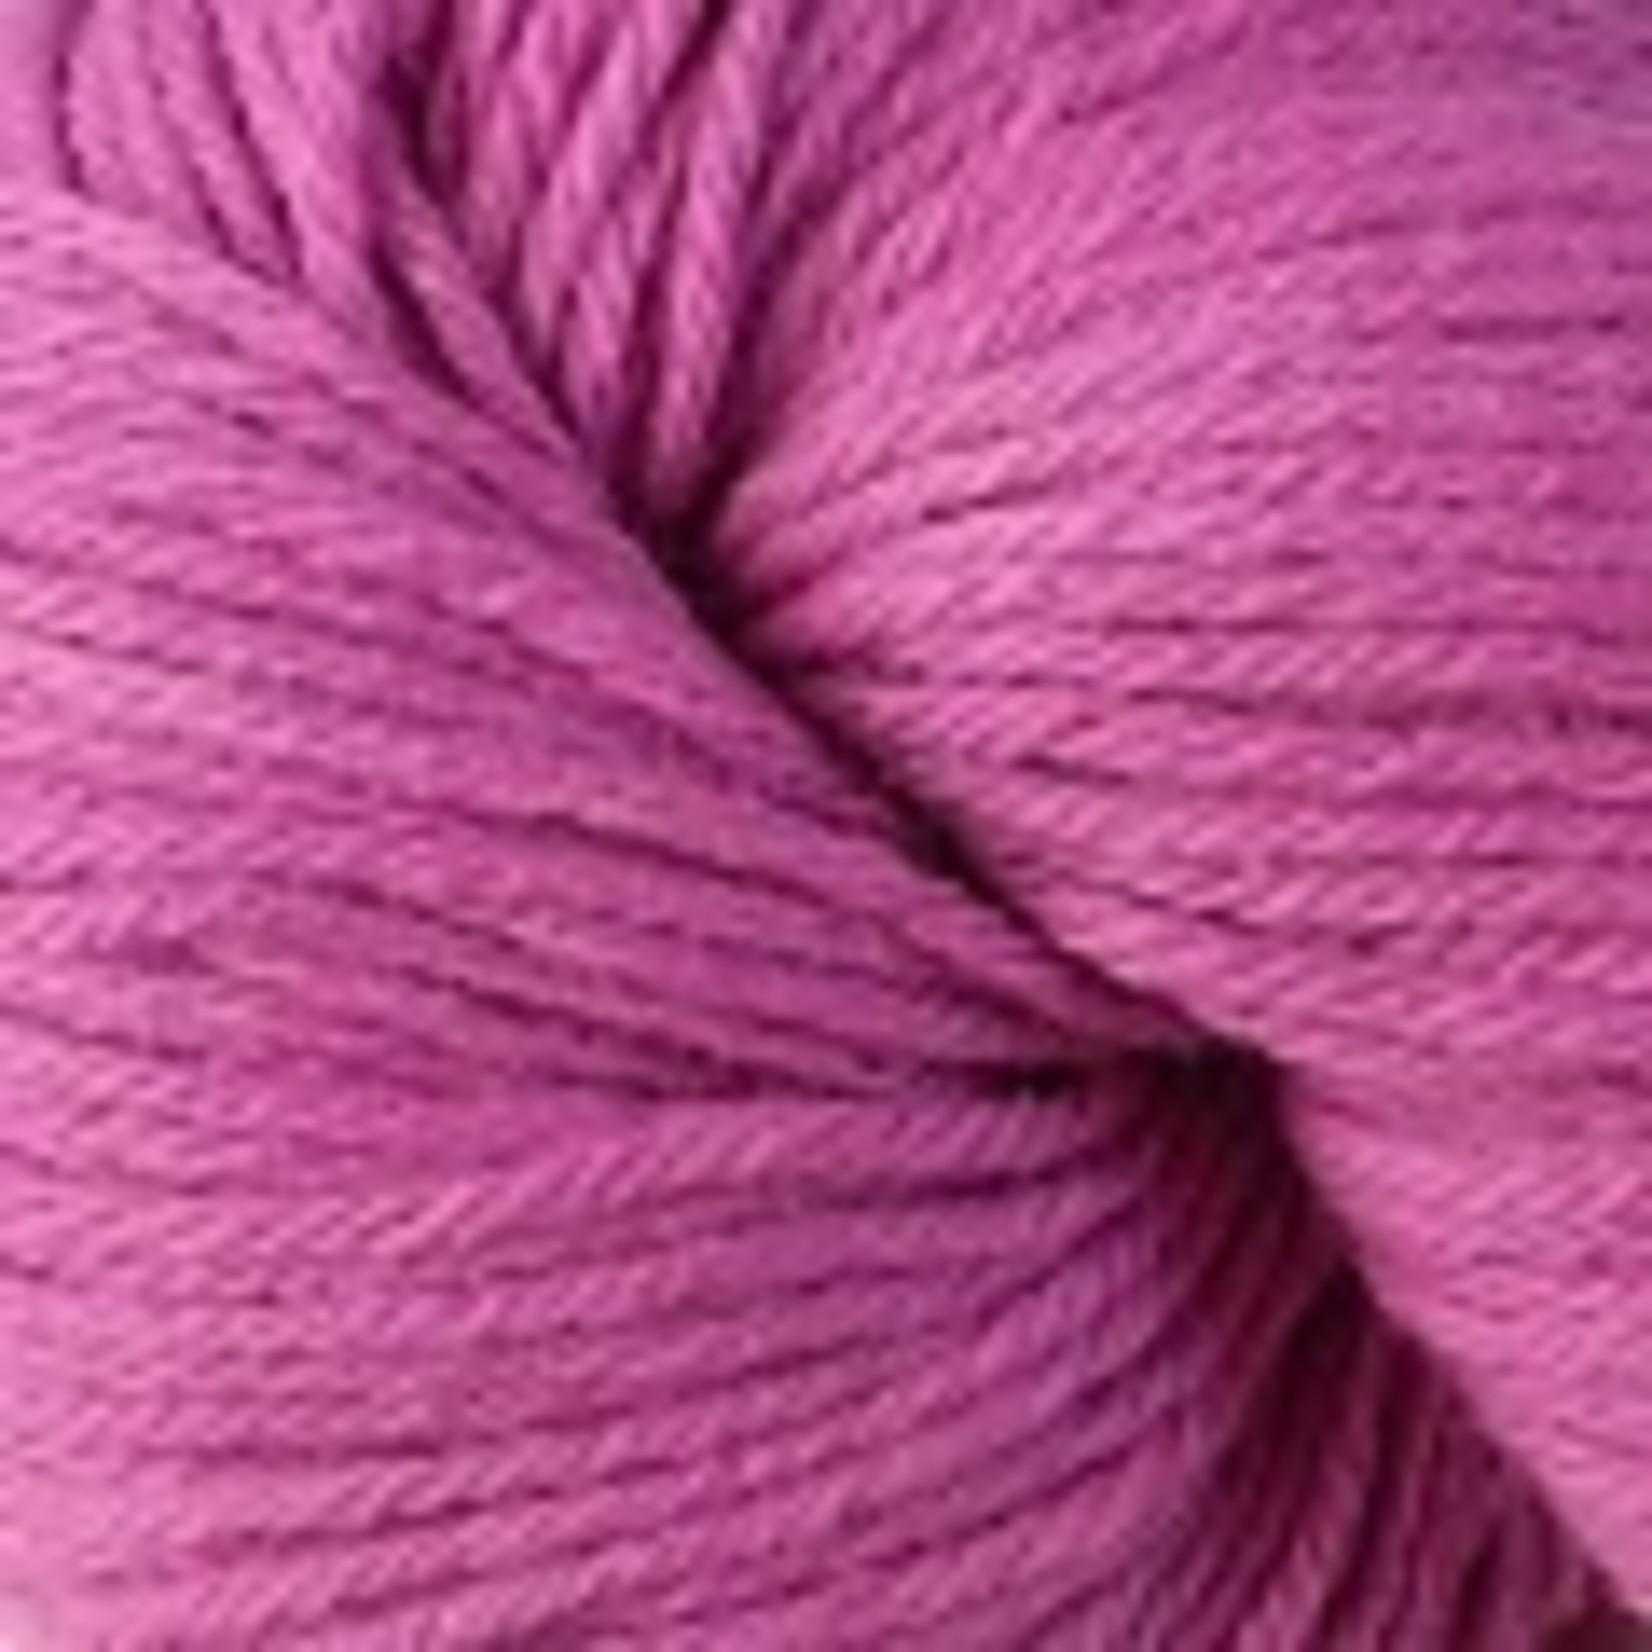 Berroco Vintage Wool, 5123, Blush